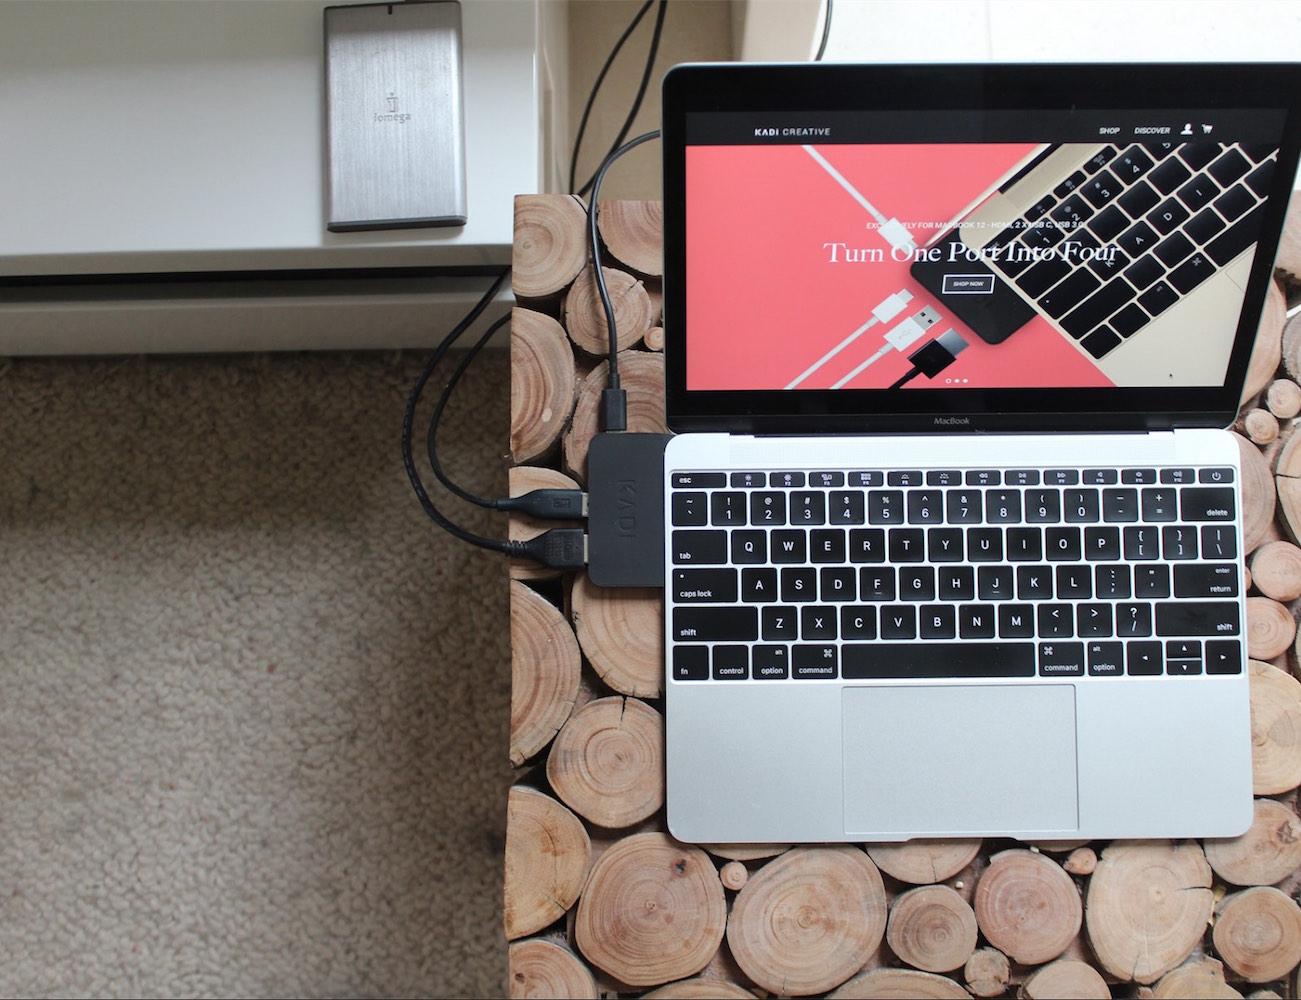 The KADi Port – Adapter For Macbook 12